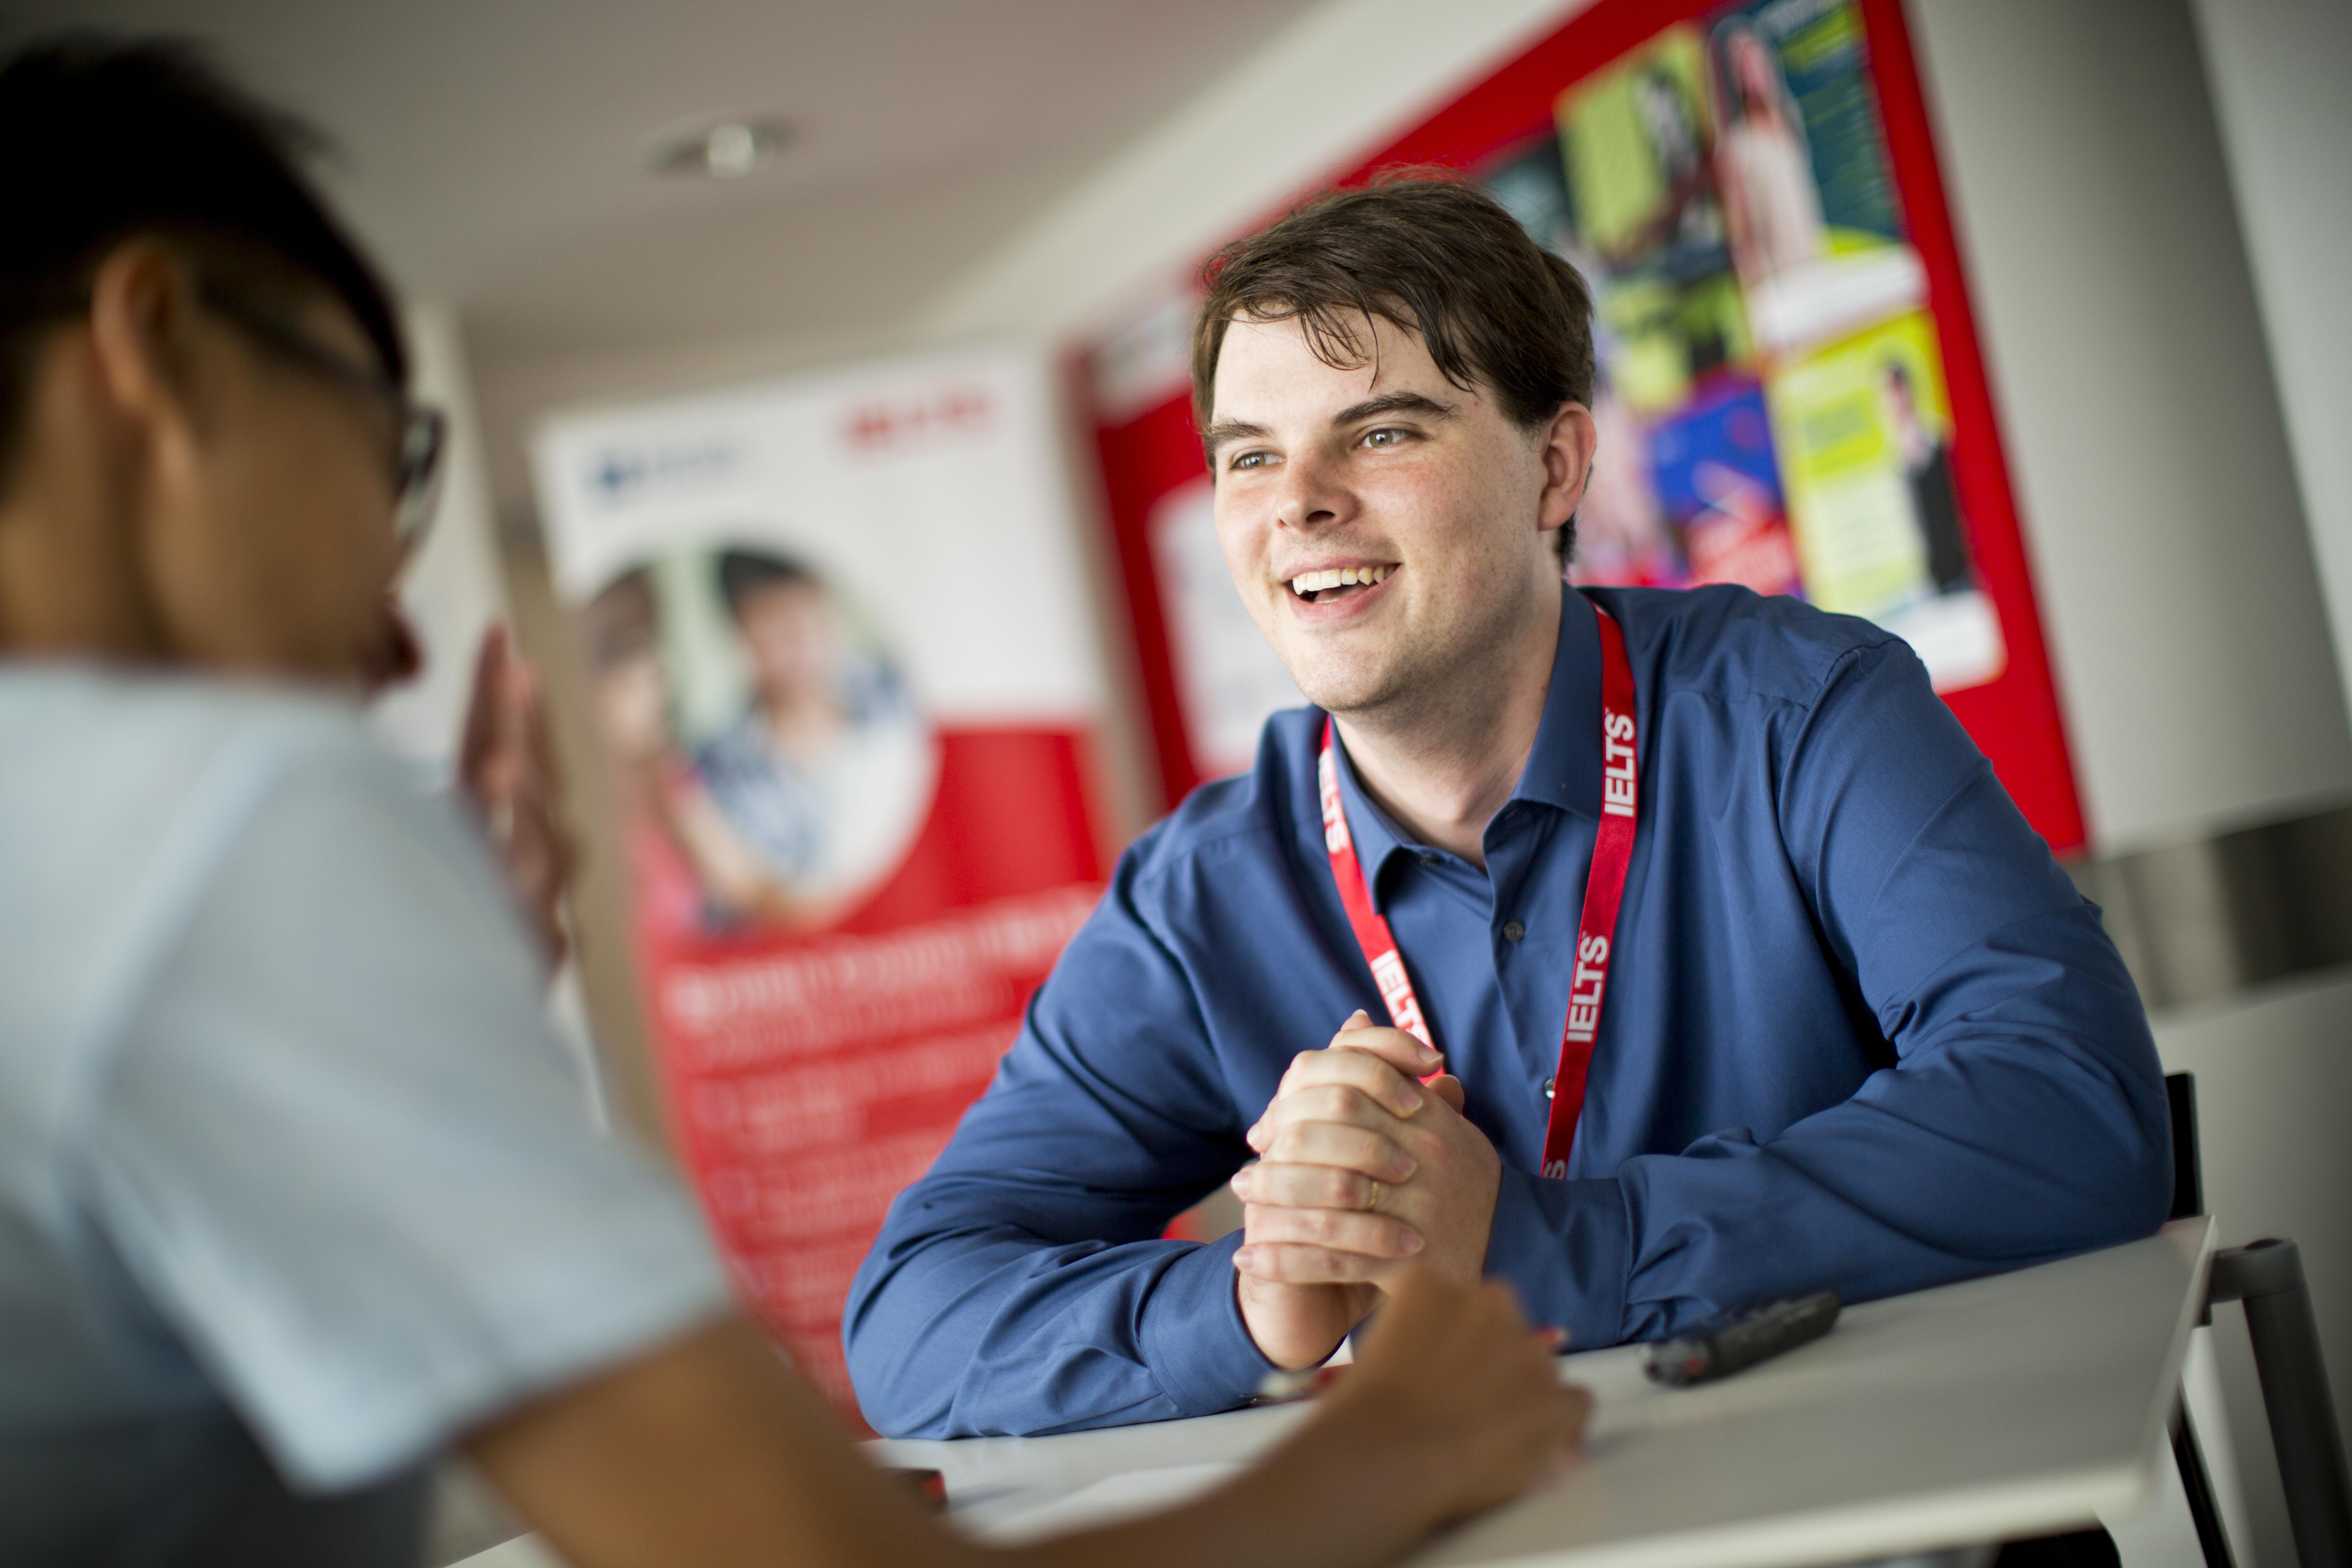 A smiling interviewer talks to an IELTS candidate